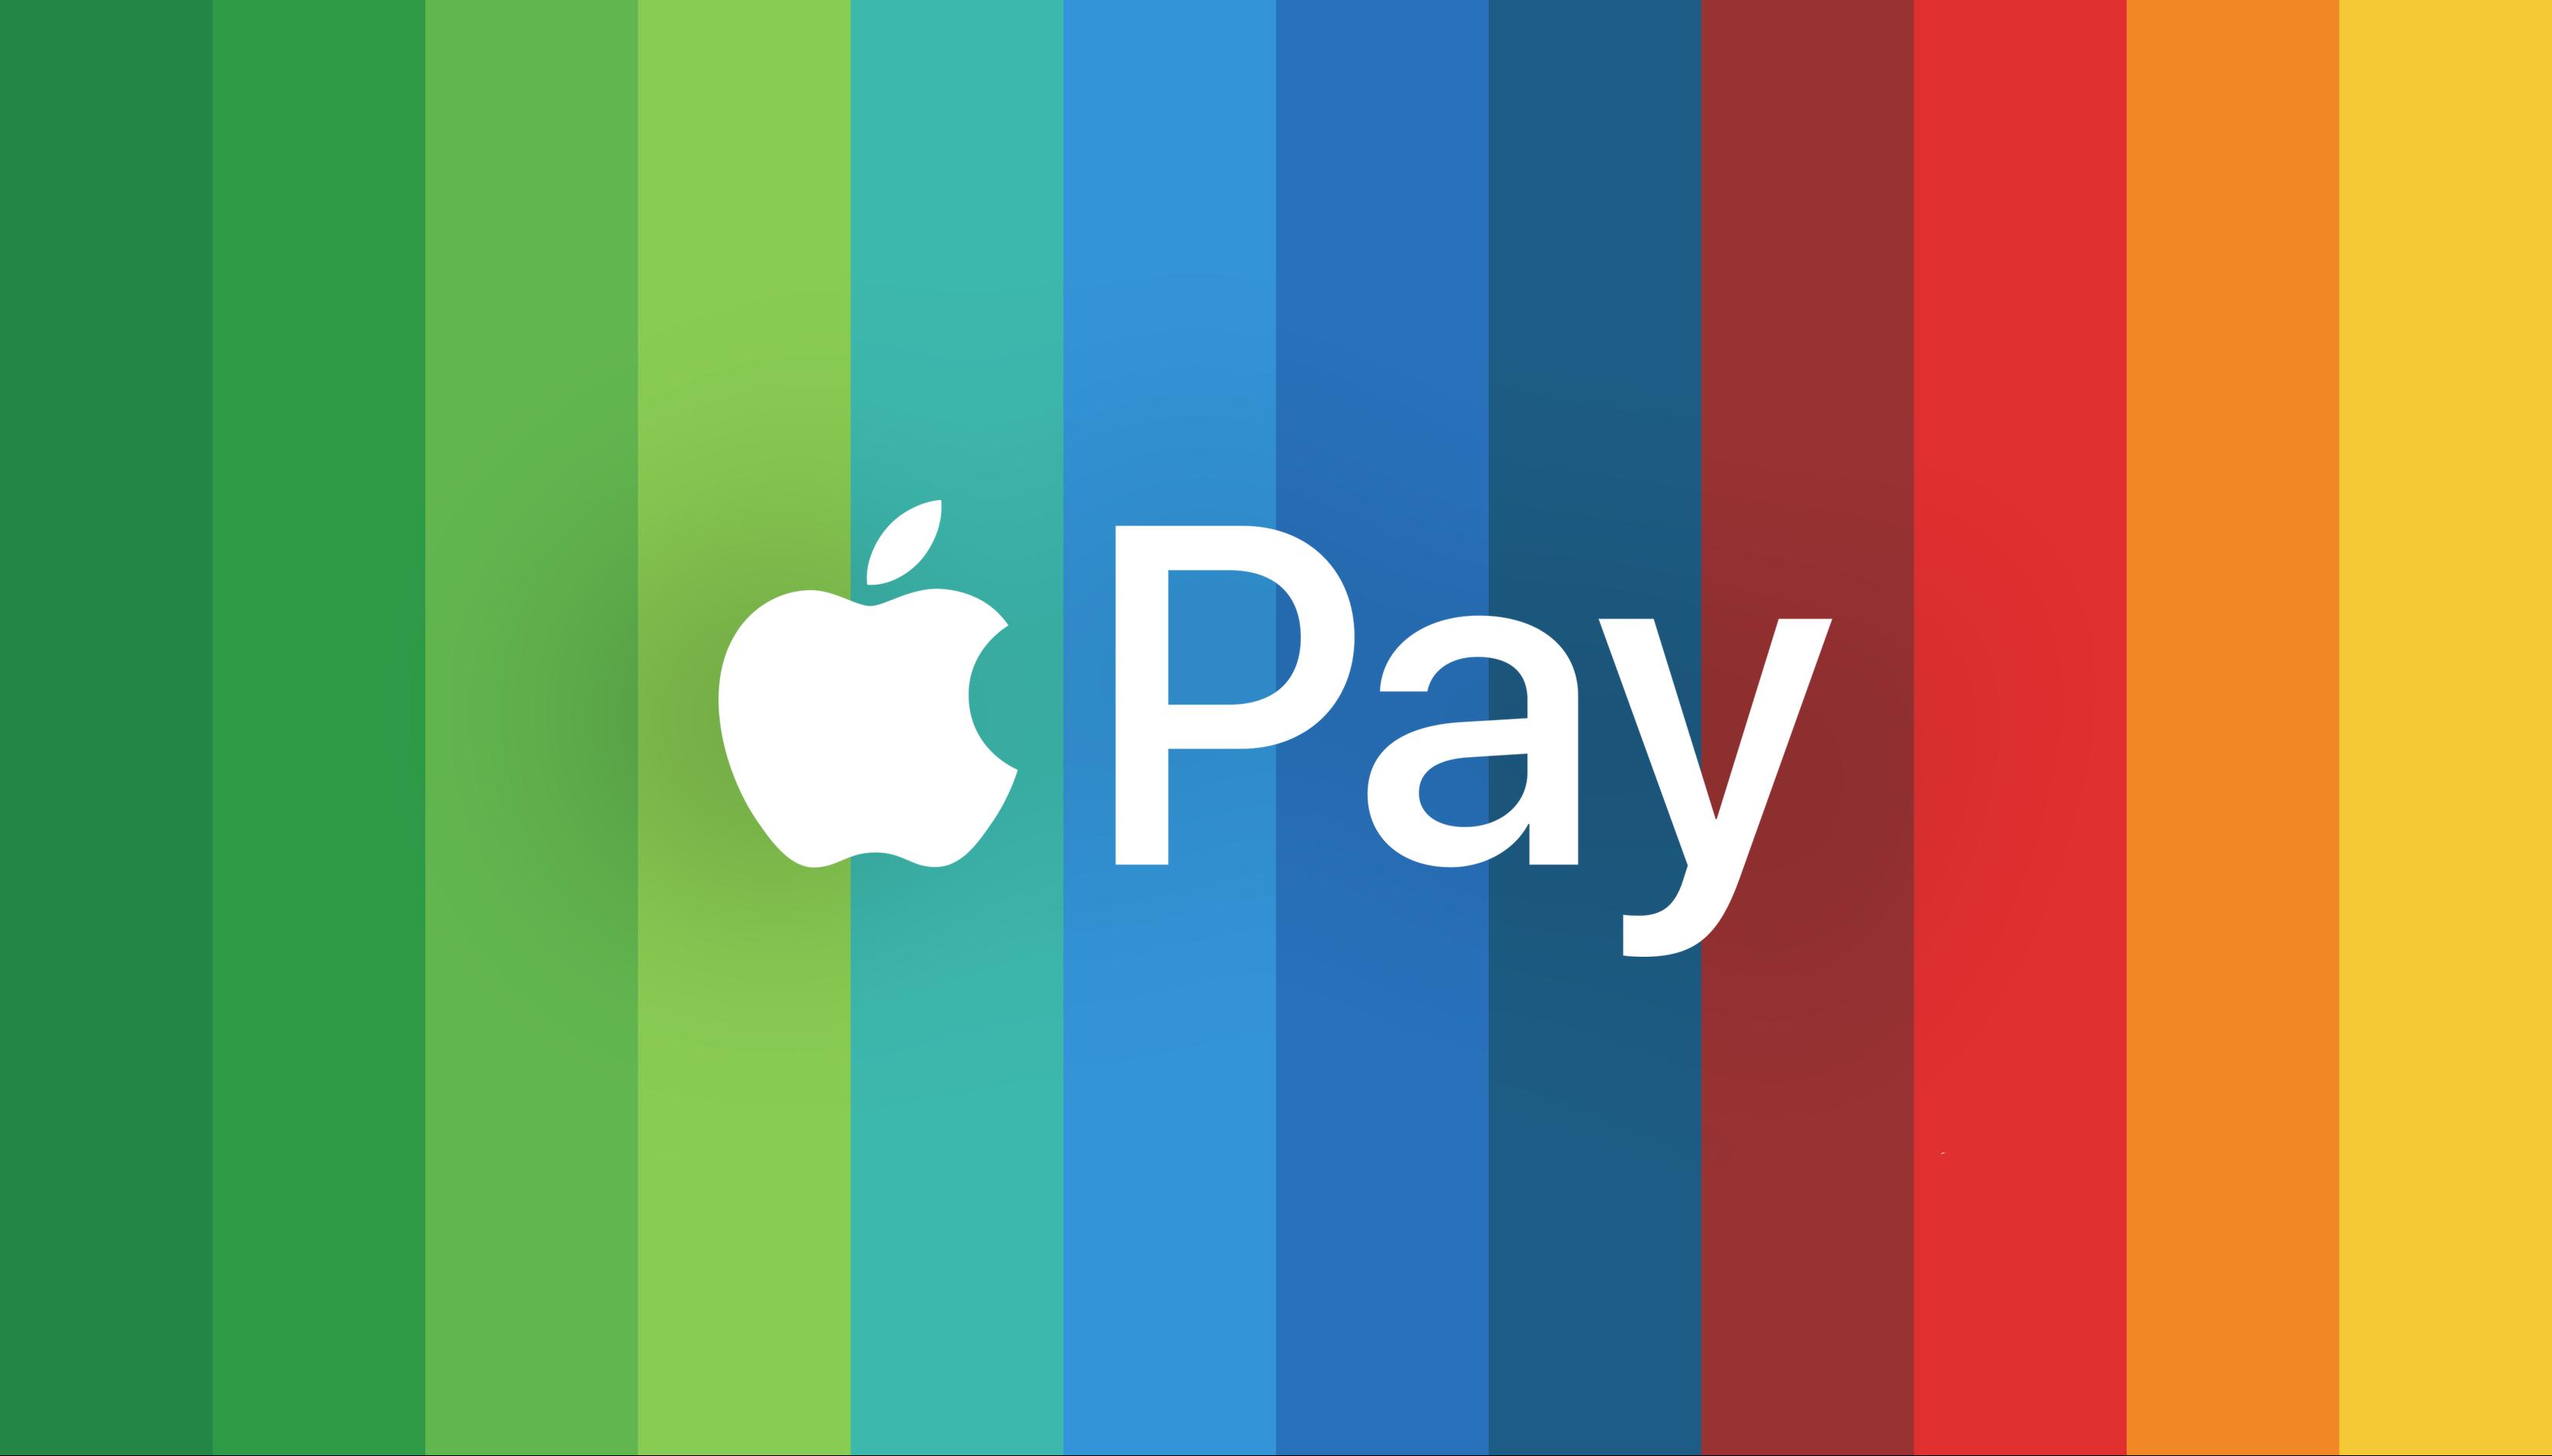 Bunq Start Apple Pay In Spanje En Italië Onofficieel Ook In